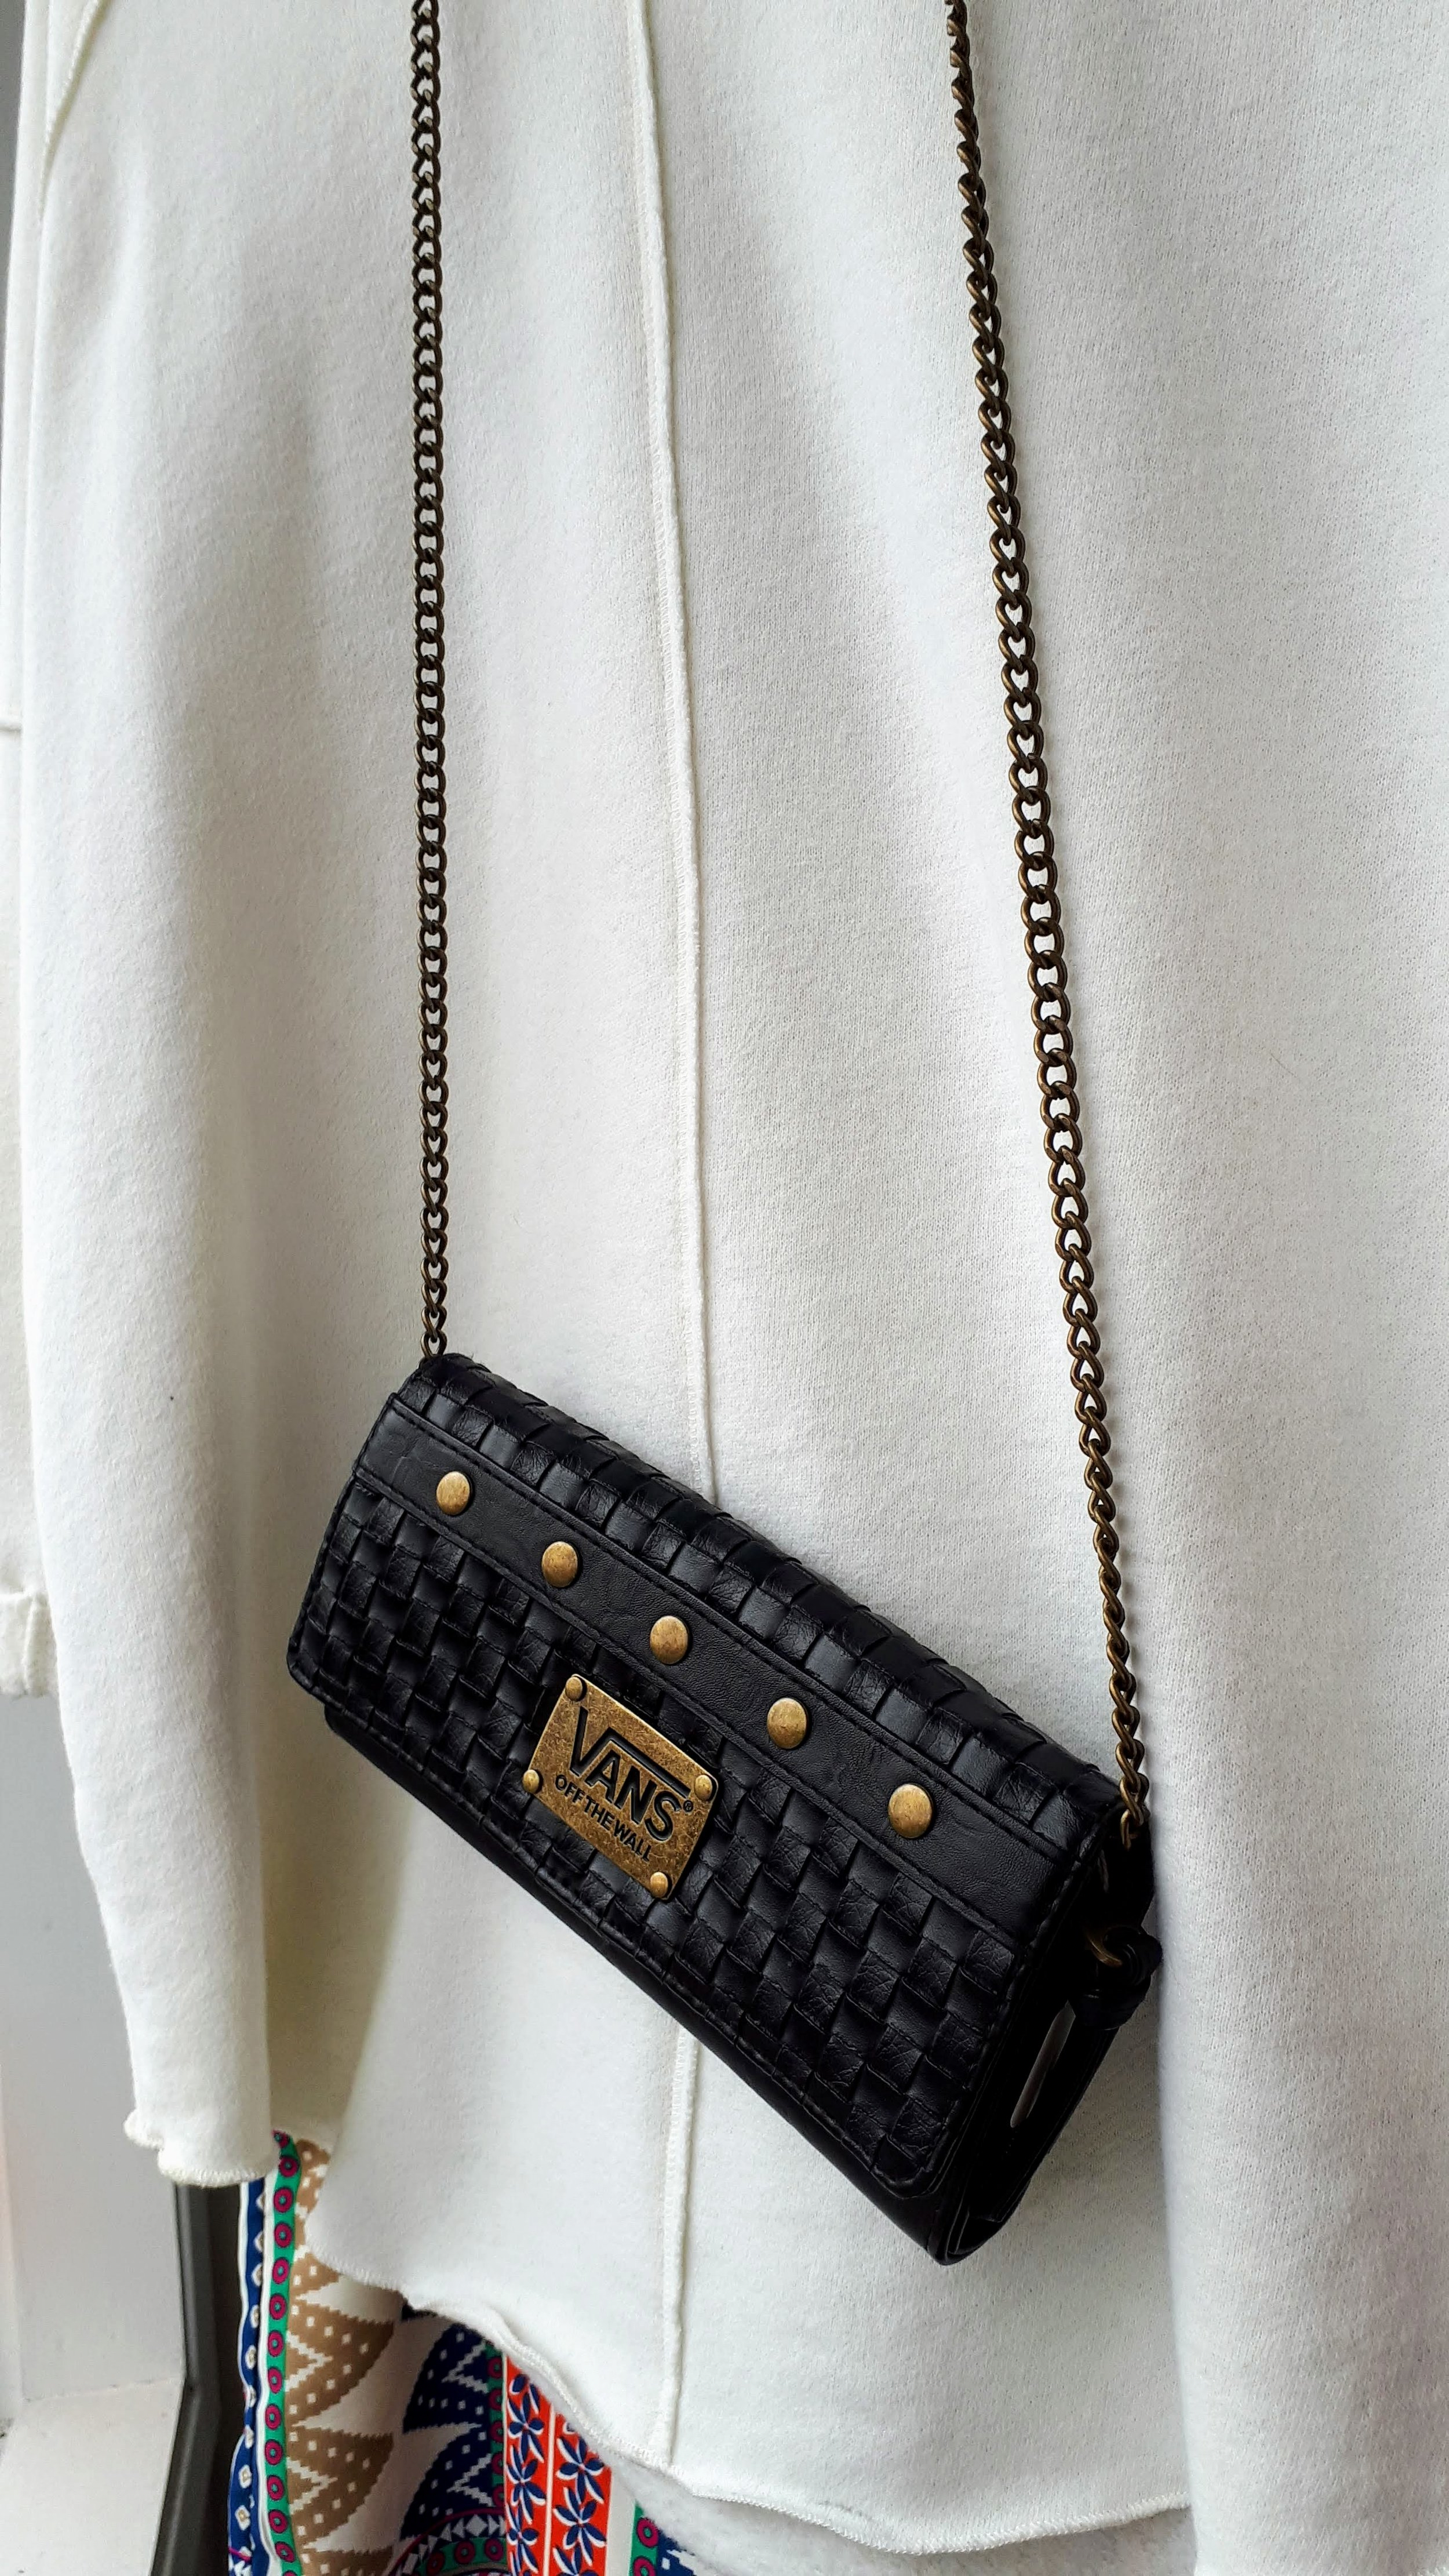 Vans purse, $18